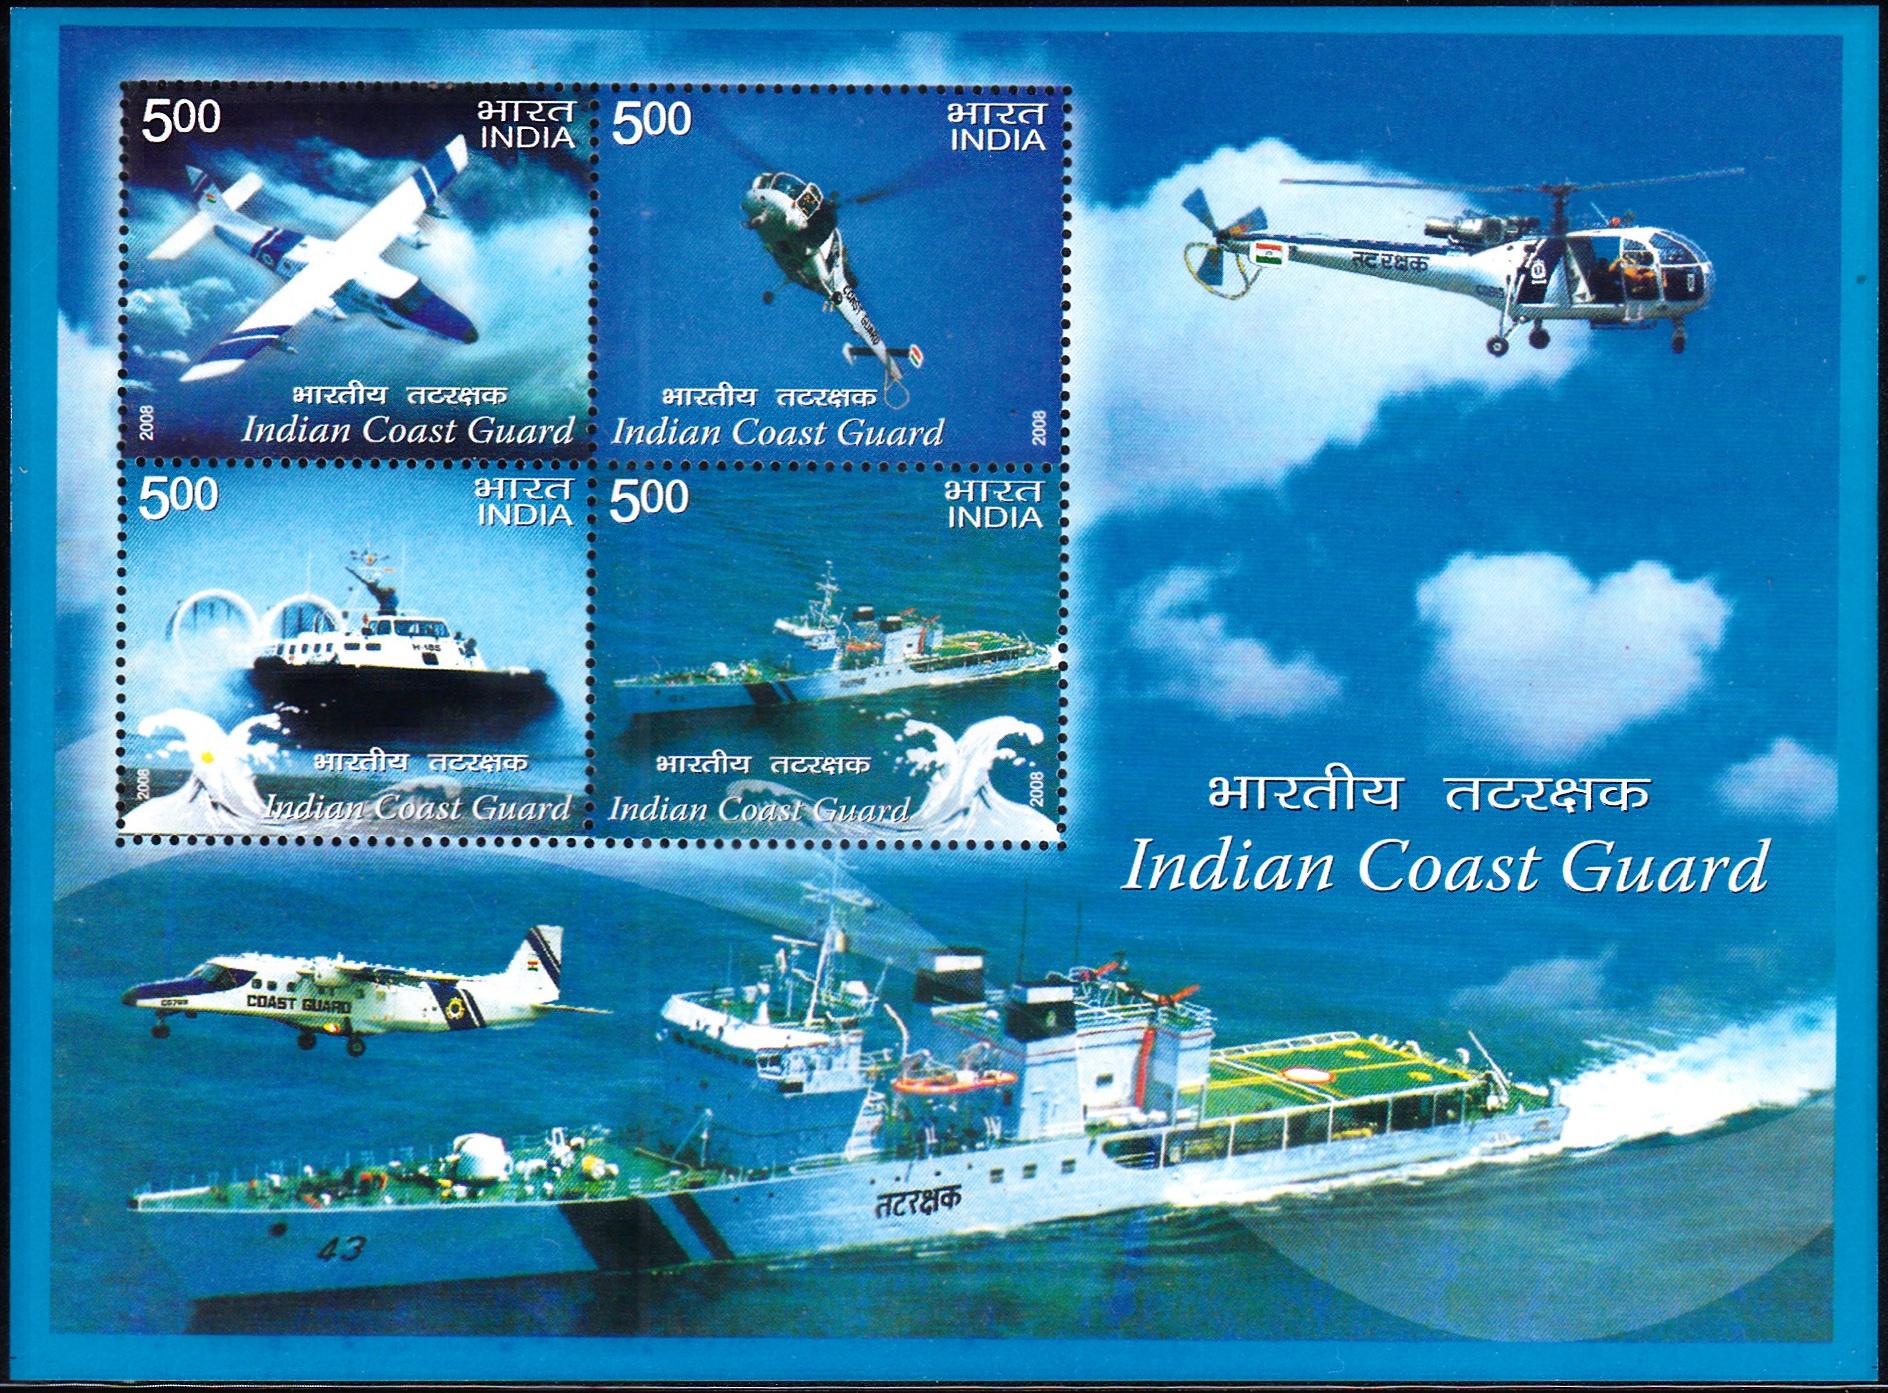 Dornier Do 228, HAL Dhruv, Hovercraft and Patrol boat